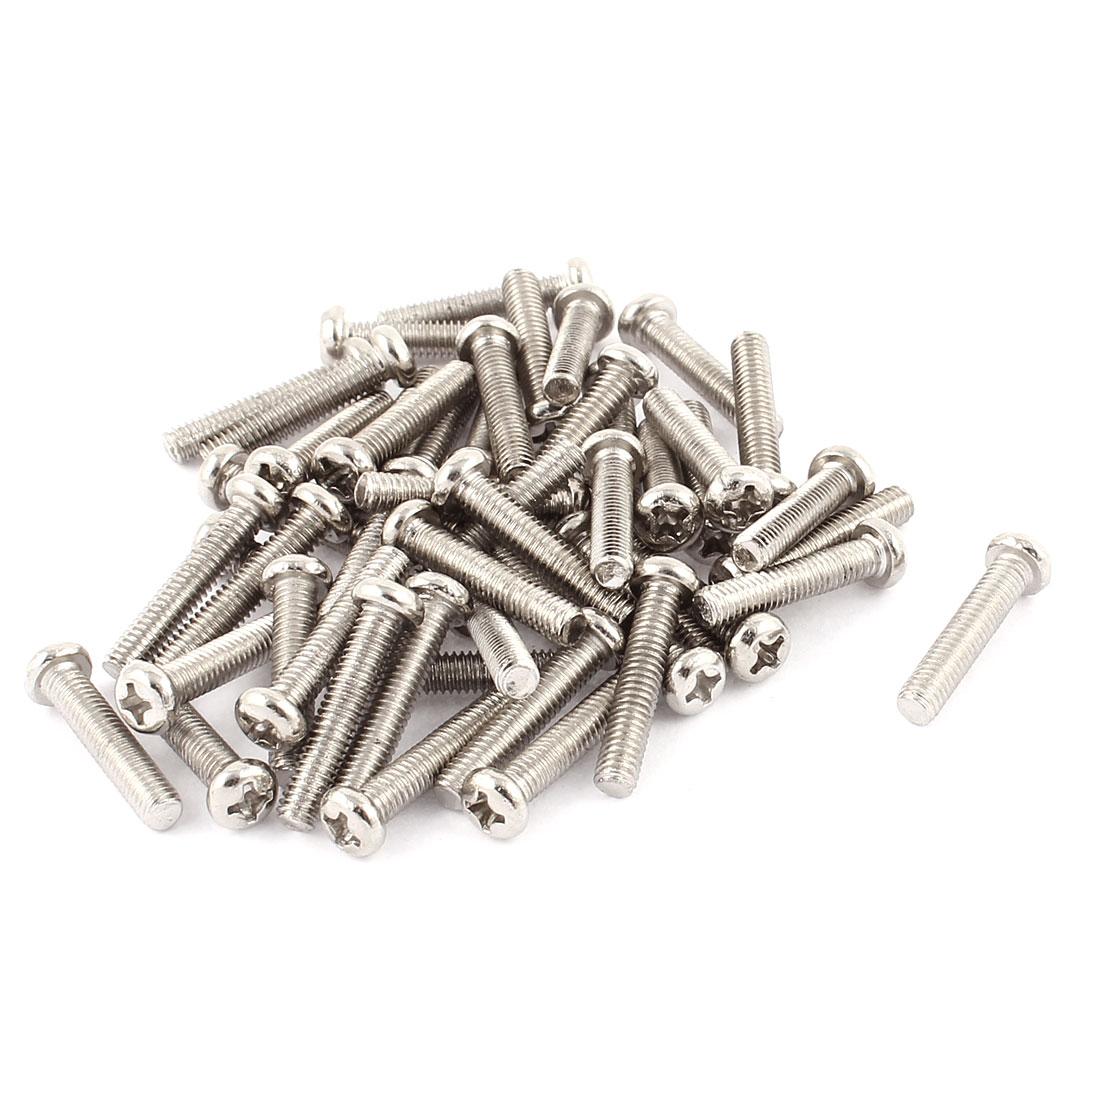 50 Pcs M4x20mm Stainless Steel Round Head Phillips Machine Screws Bolts